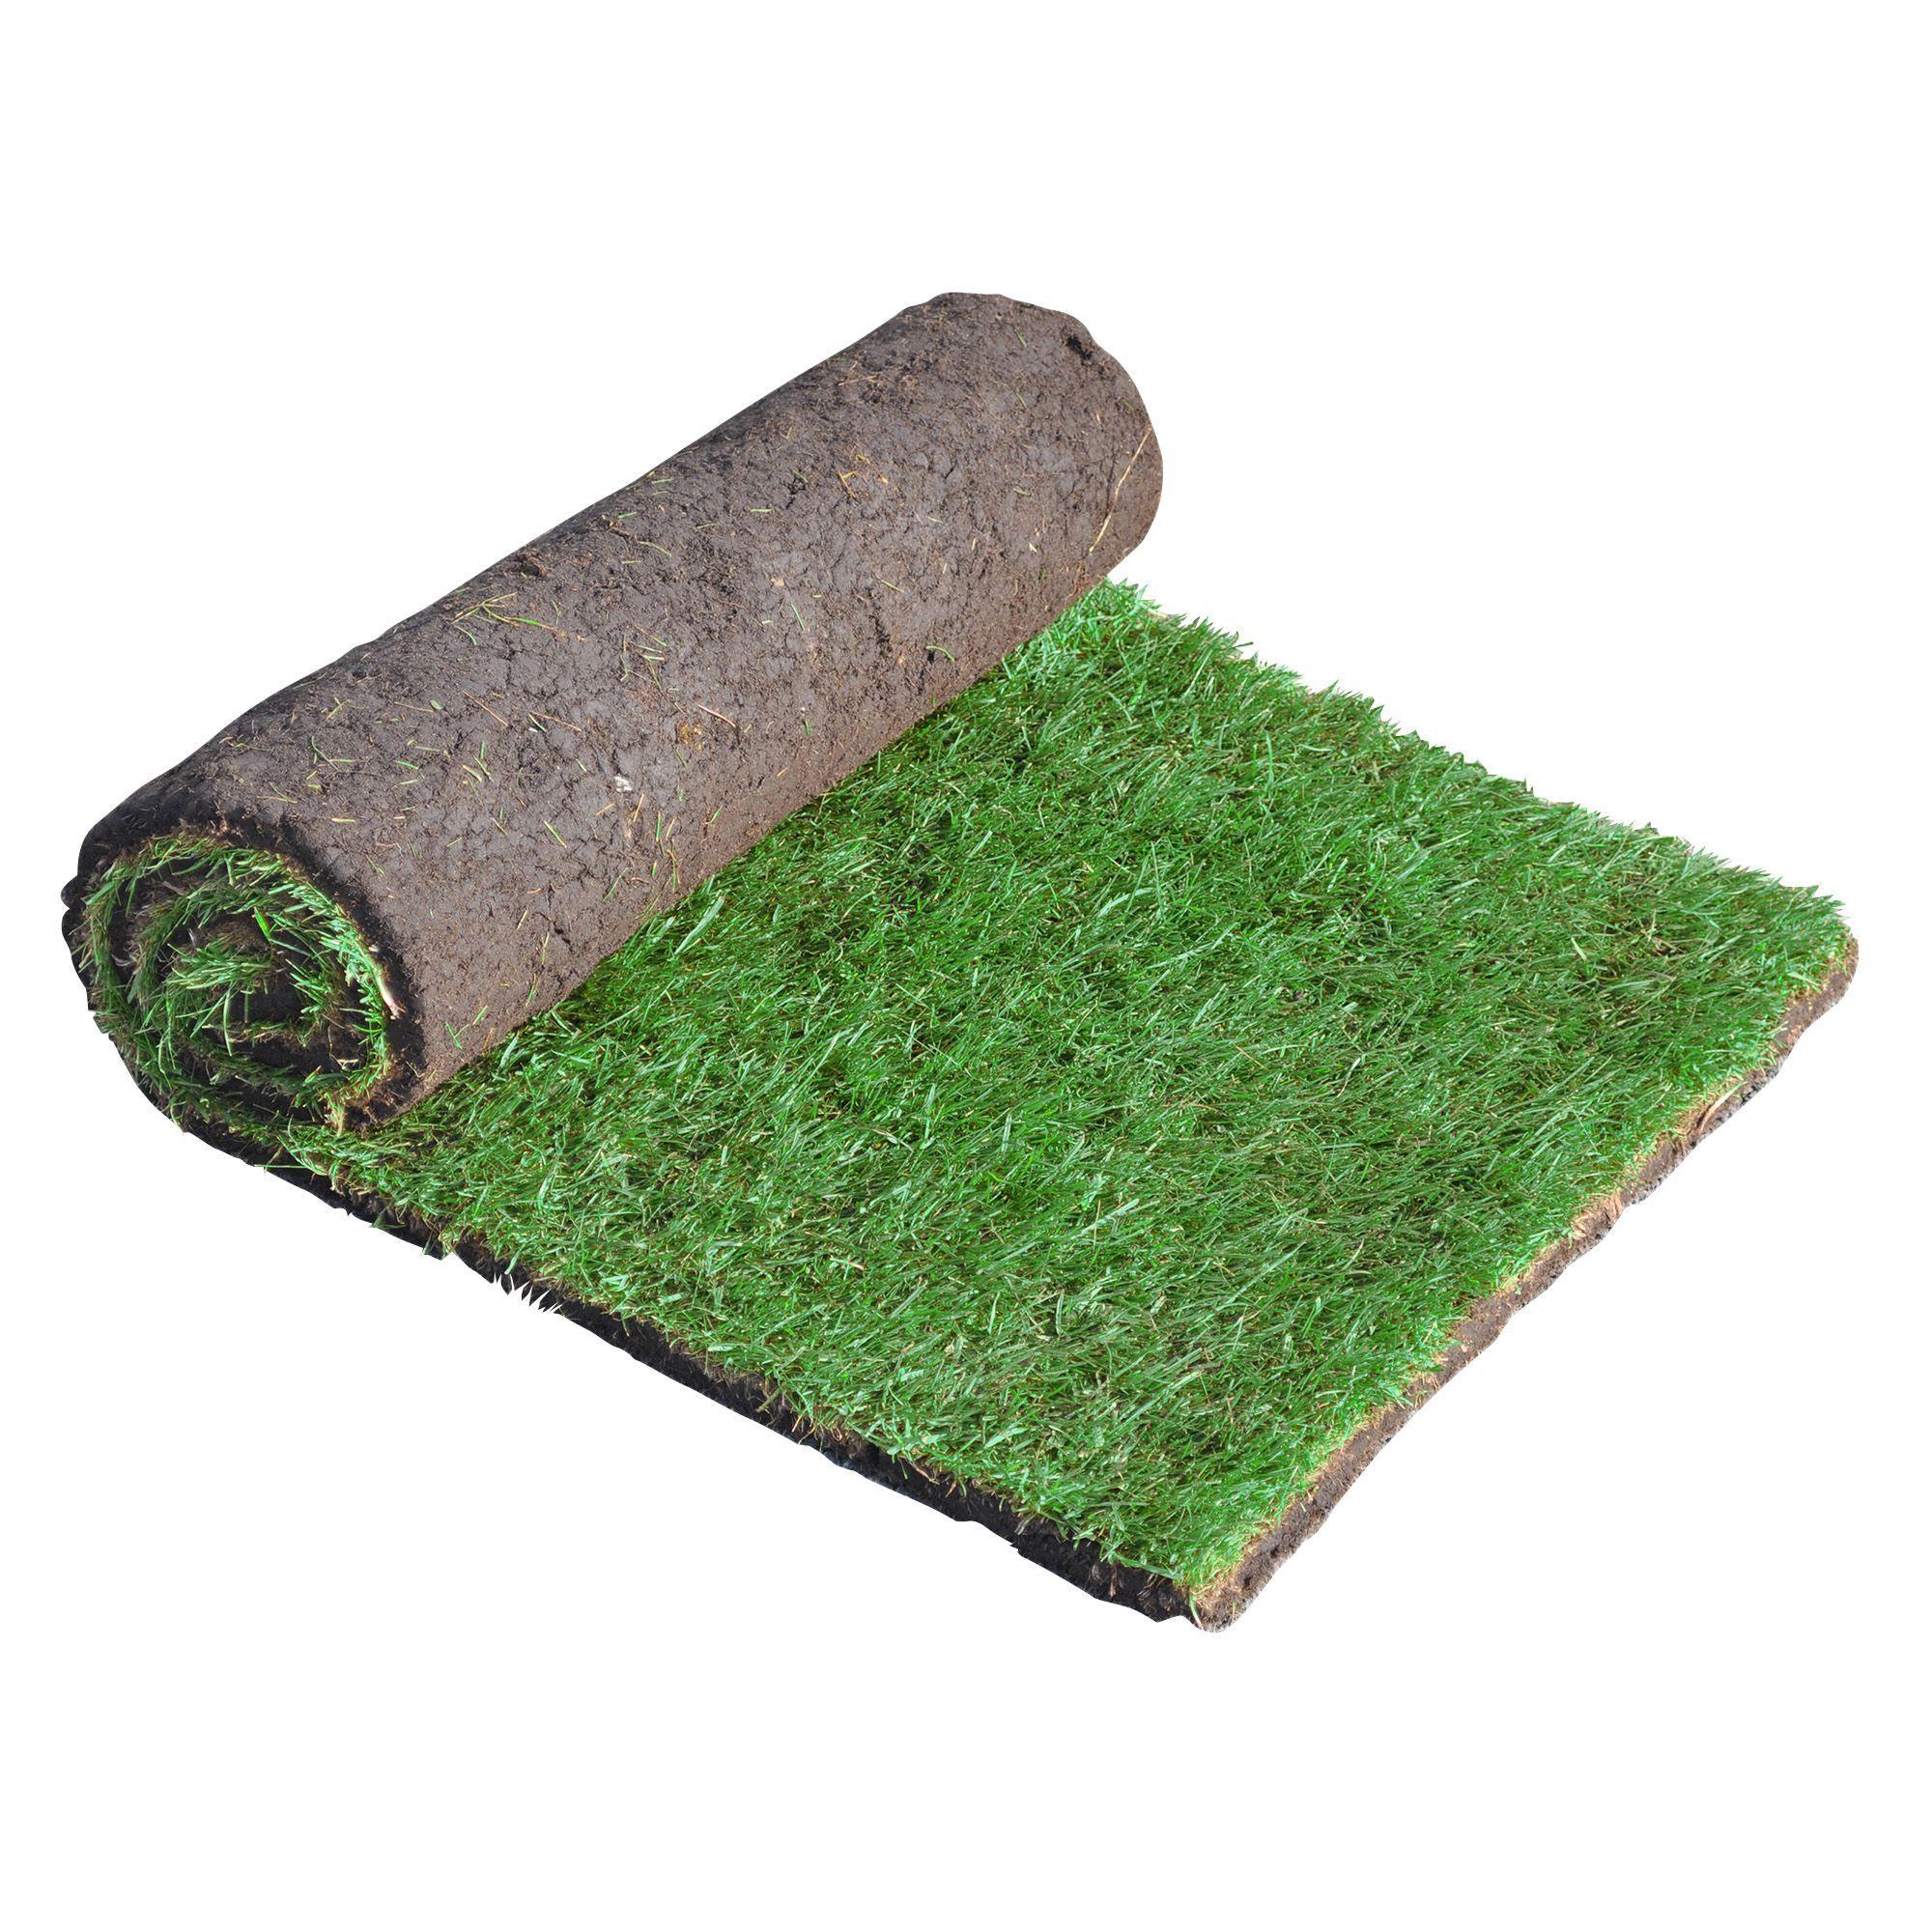 Landscaping Grass Roll : Lawn turf w mm l roll of departments diy at b q